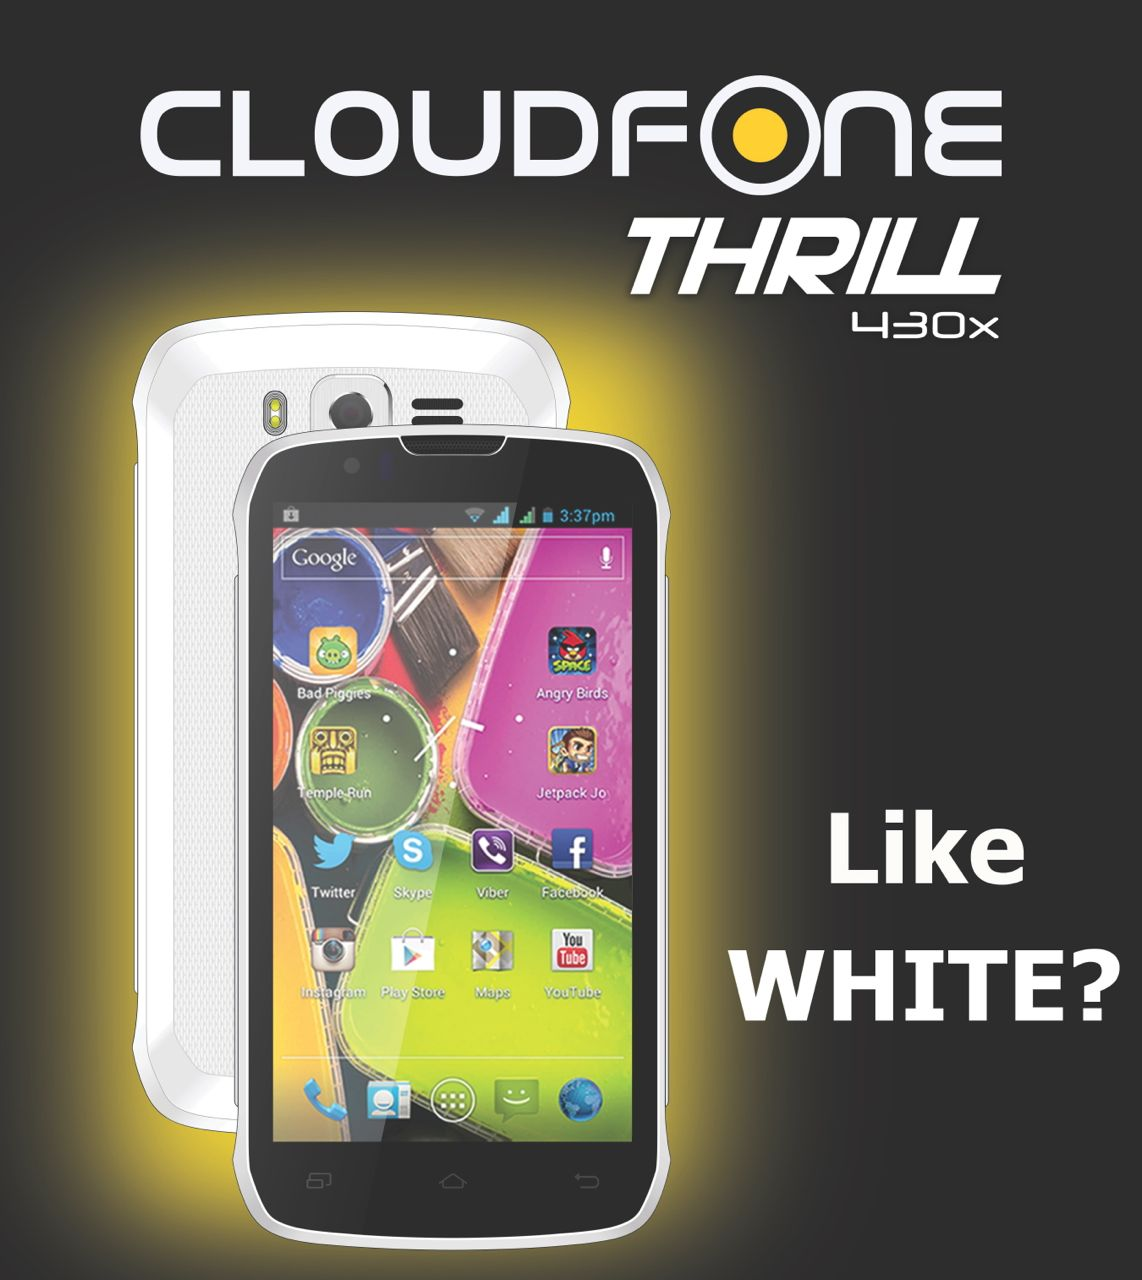 cloudfone thrill 430x white